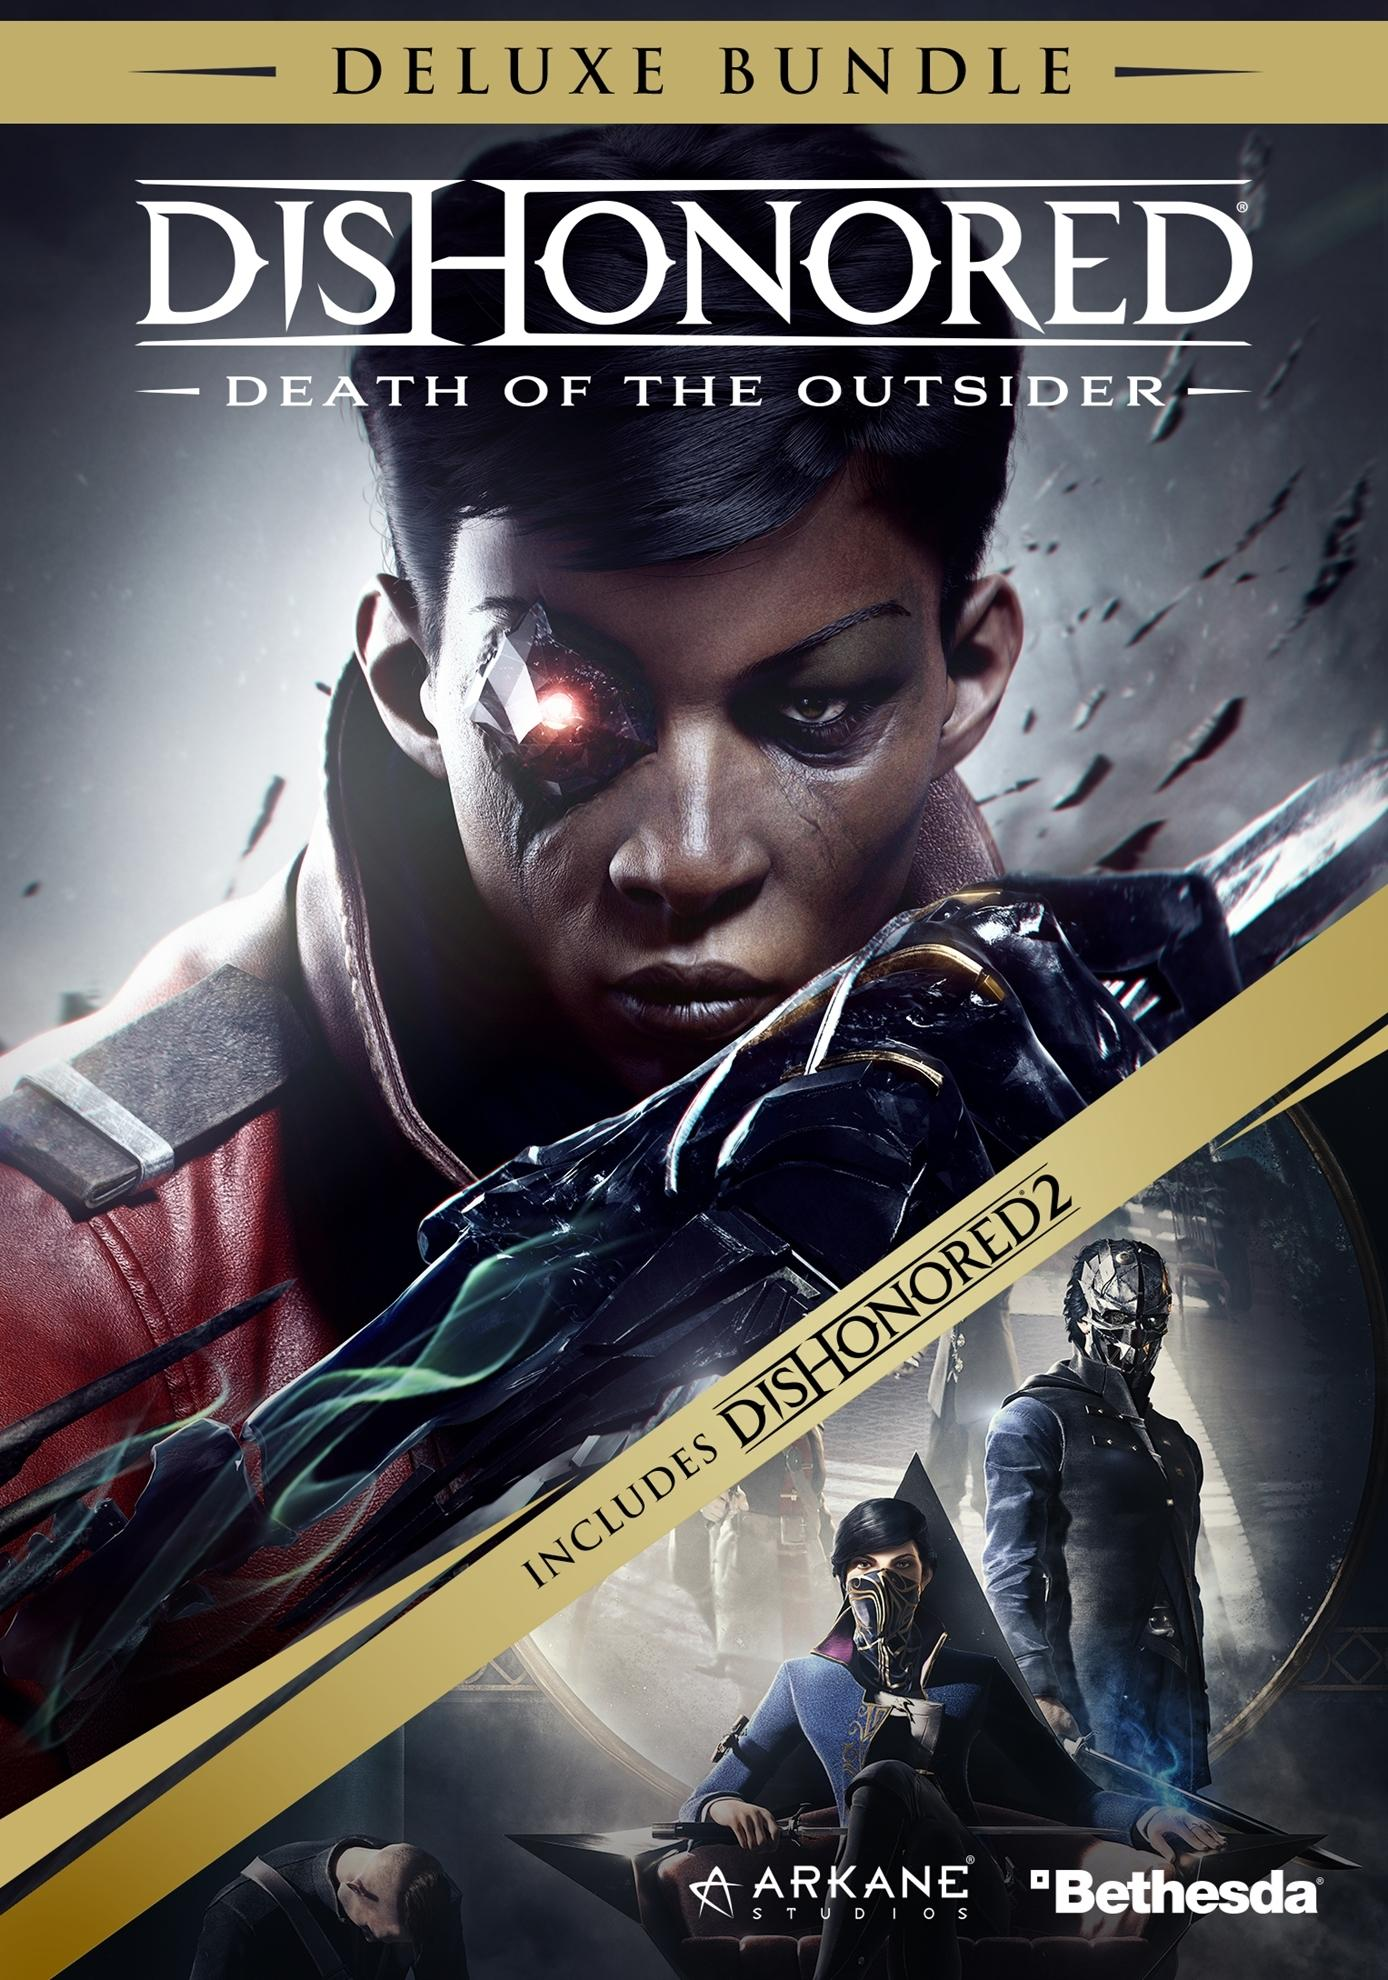 Dishonored®: Deluxe Bundle